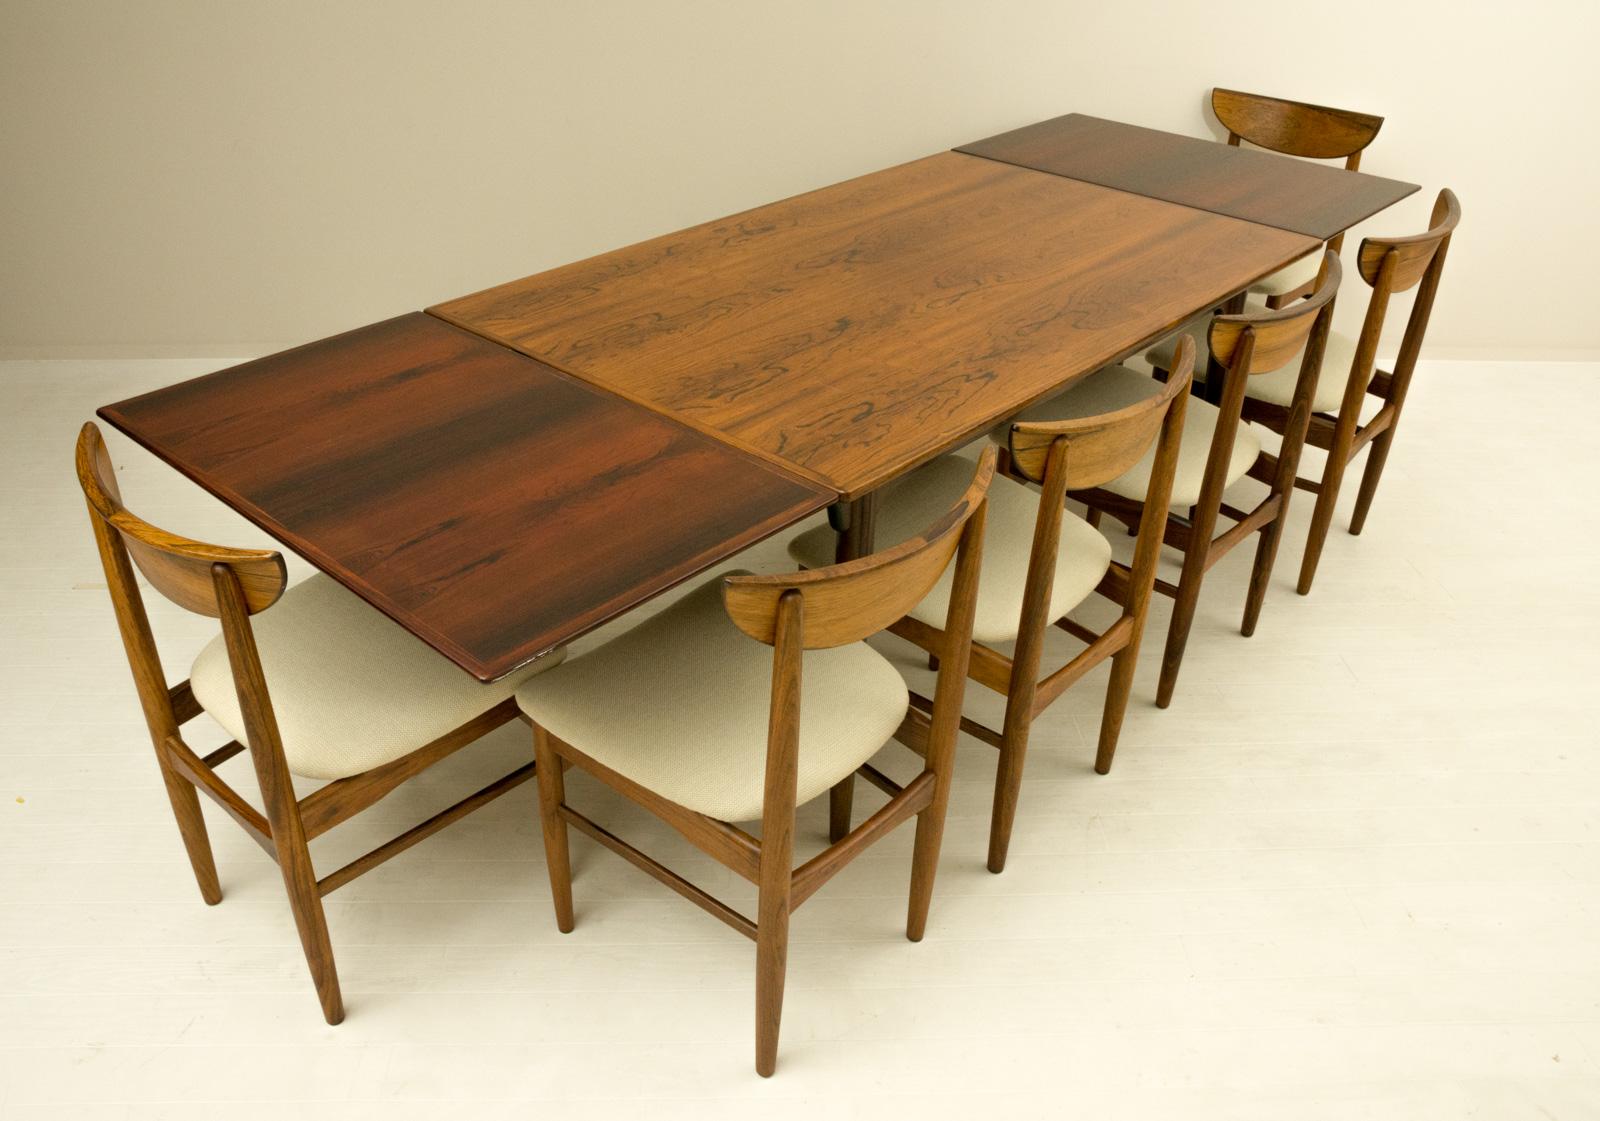 #54 Dining Table by Omann Jun